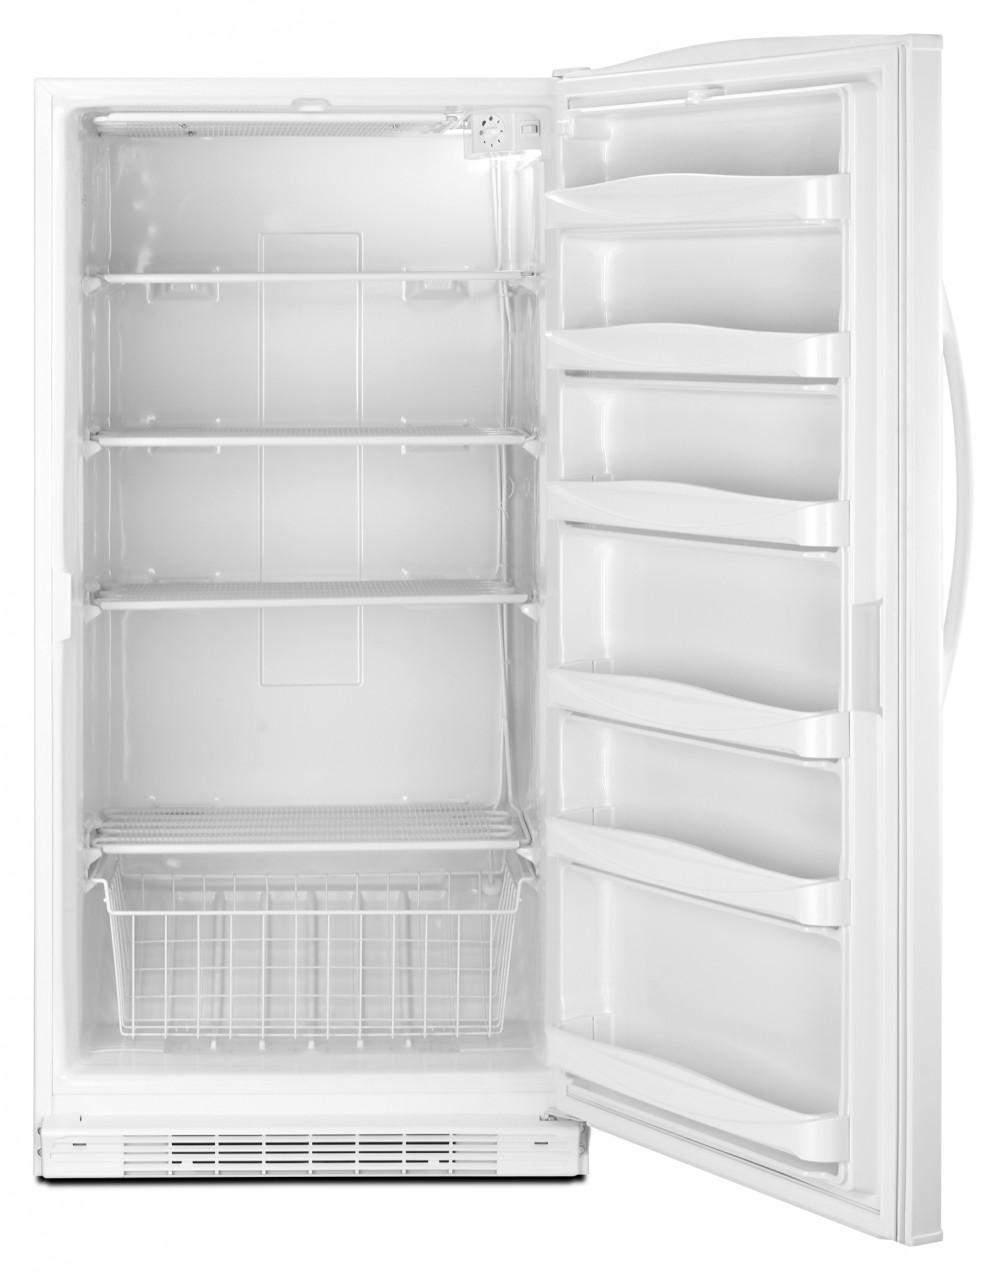 Aqu2003trw Amana Aqu2003trw Upright Freezers White